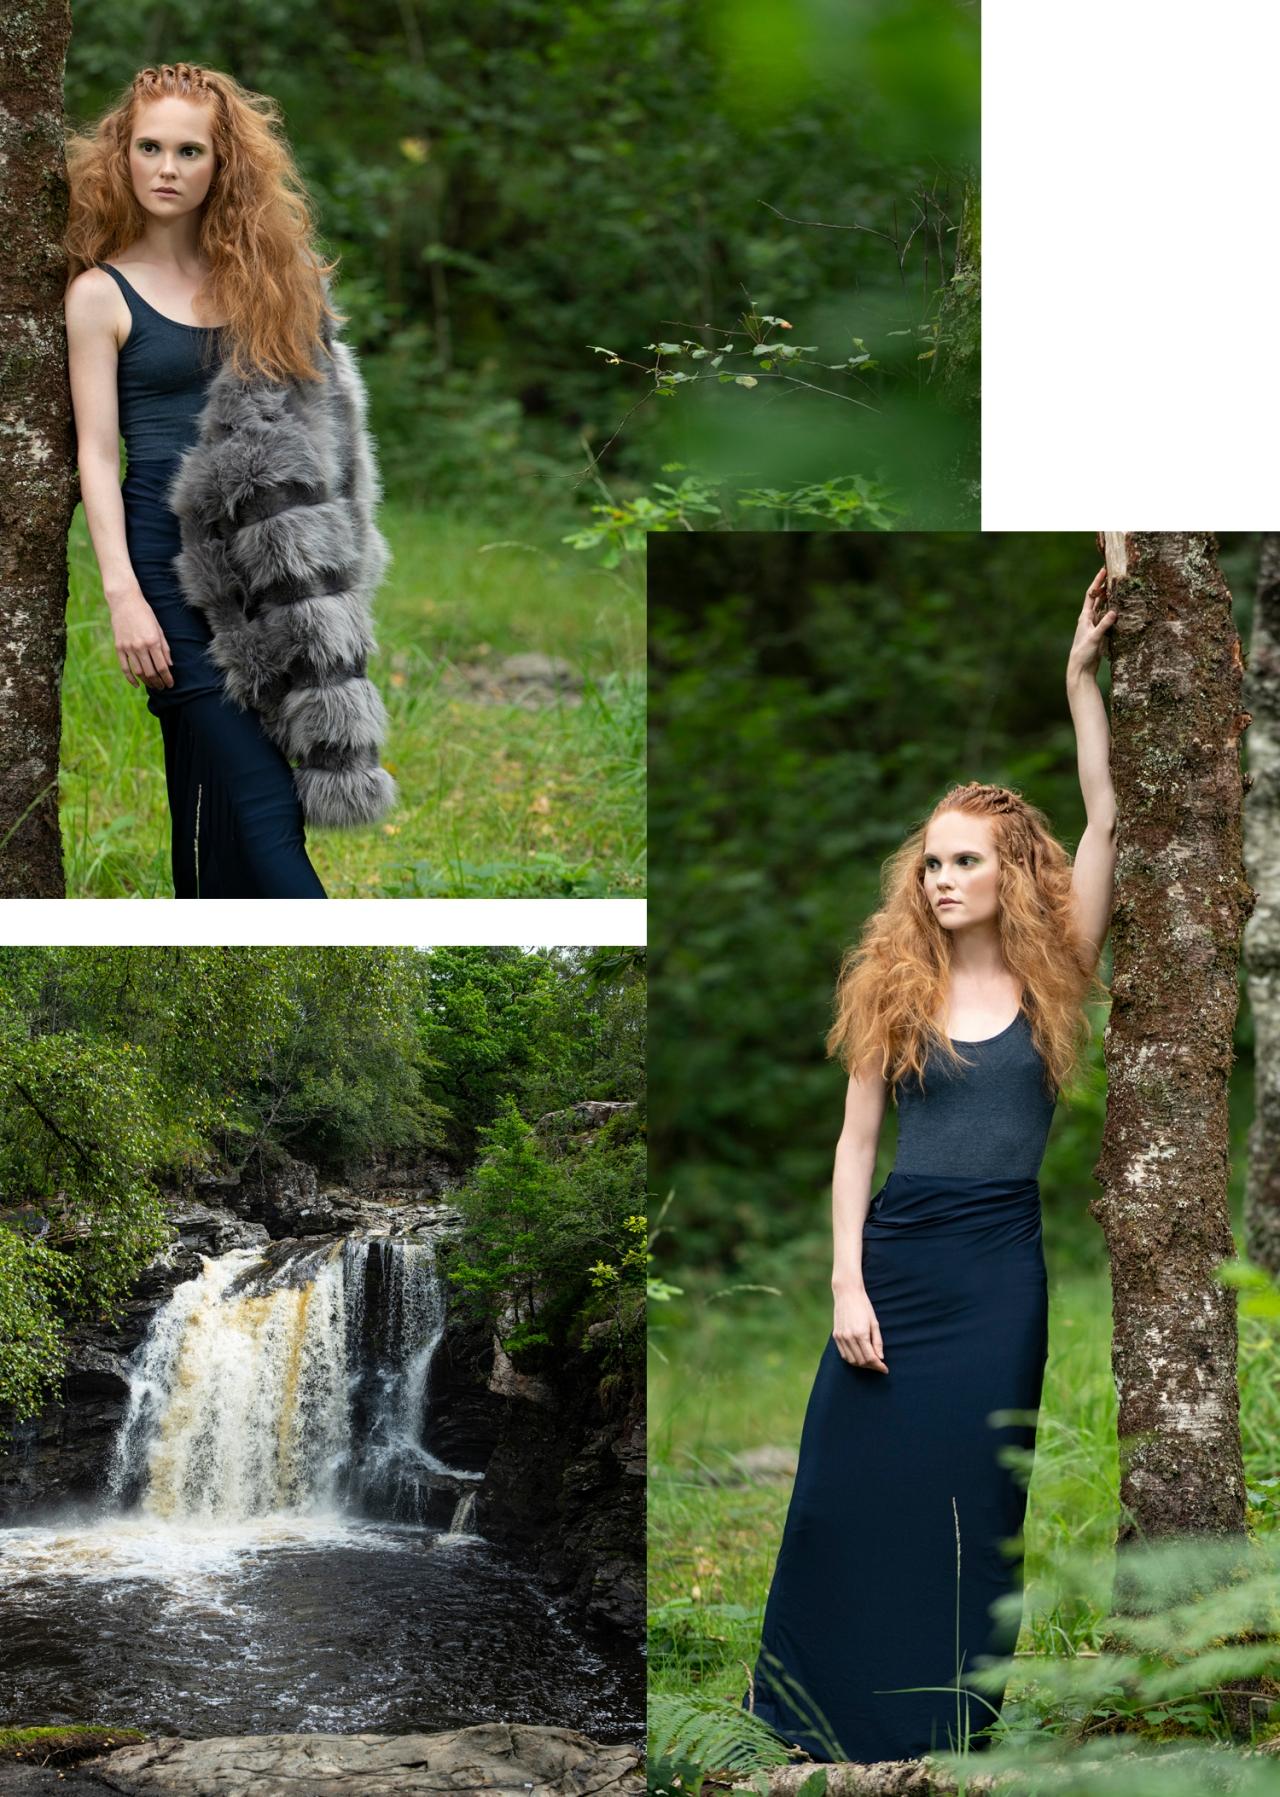 Highland-Maiden-Page-6